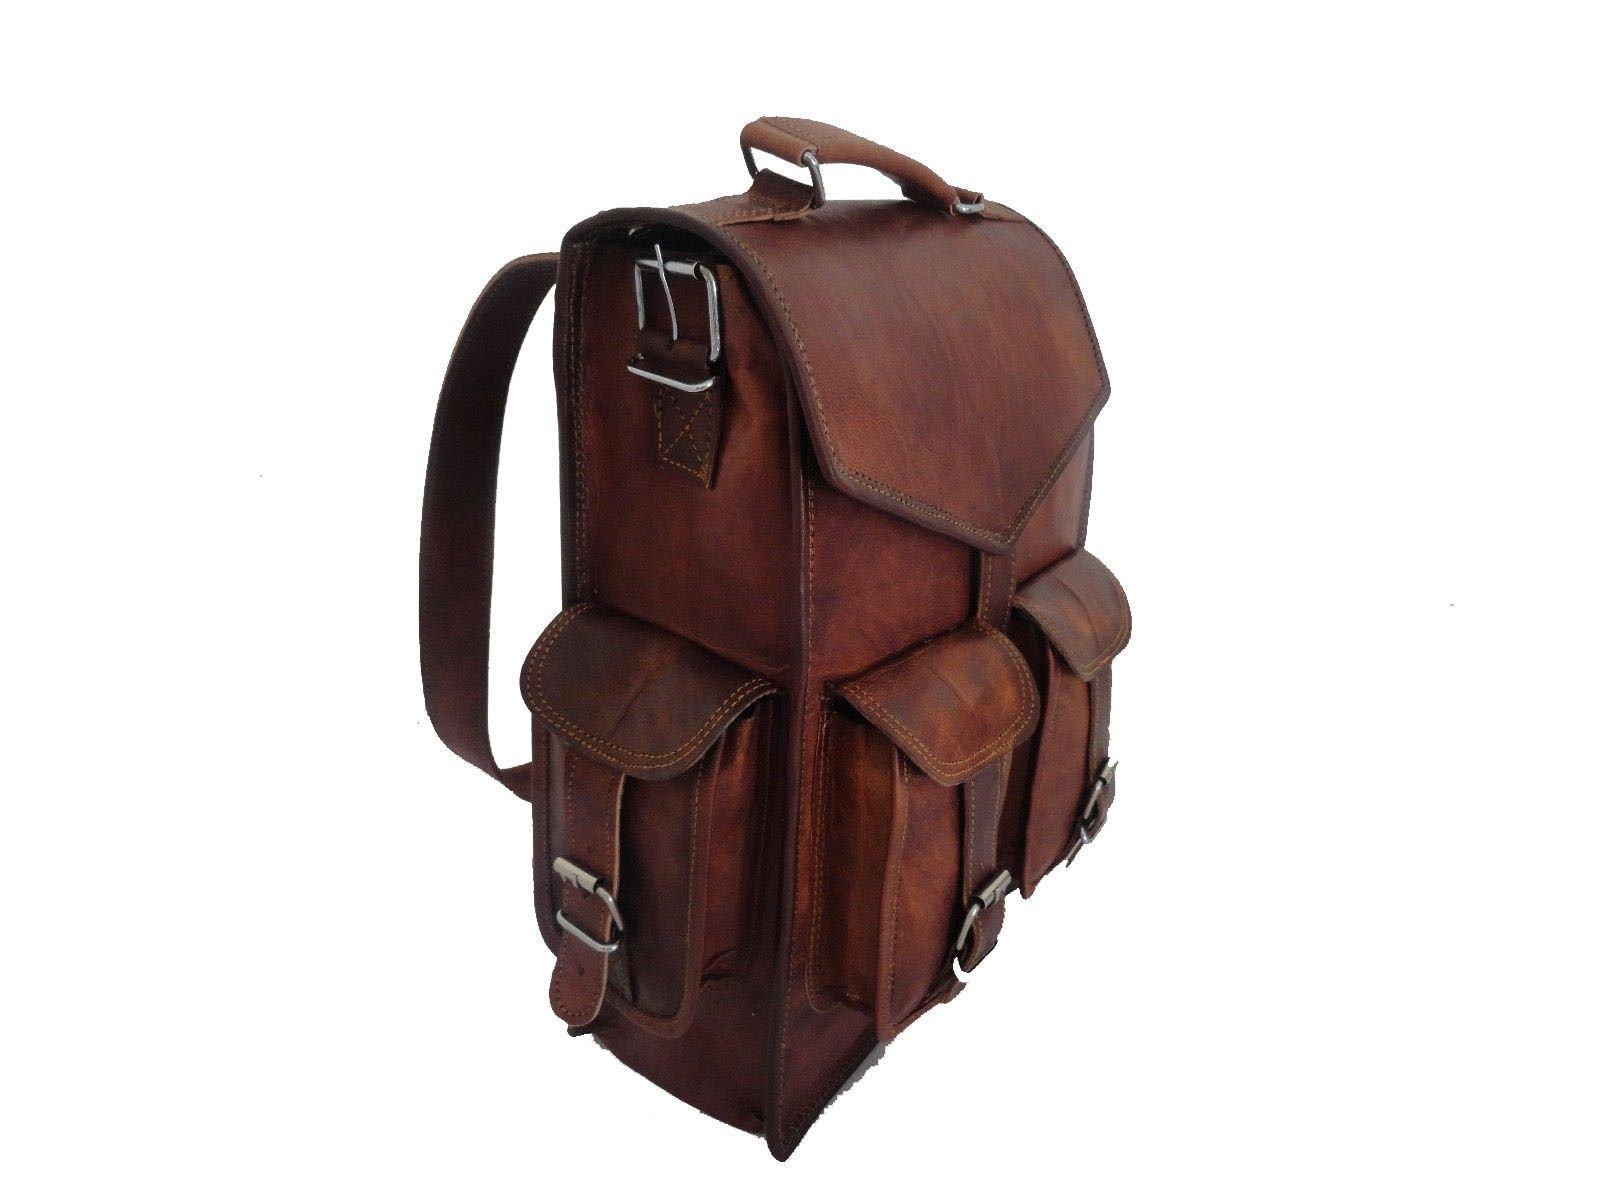 15'' Vintage Leather Backpack Laptop Messenger Lightweight School College Bag Rucksack Sling for Men Women by Indian Hando Art by Indian Hando Art